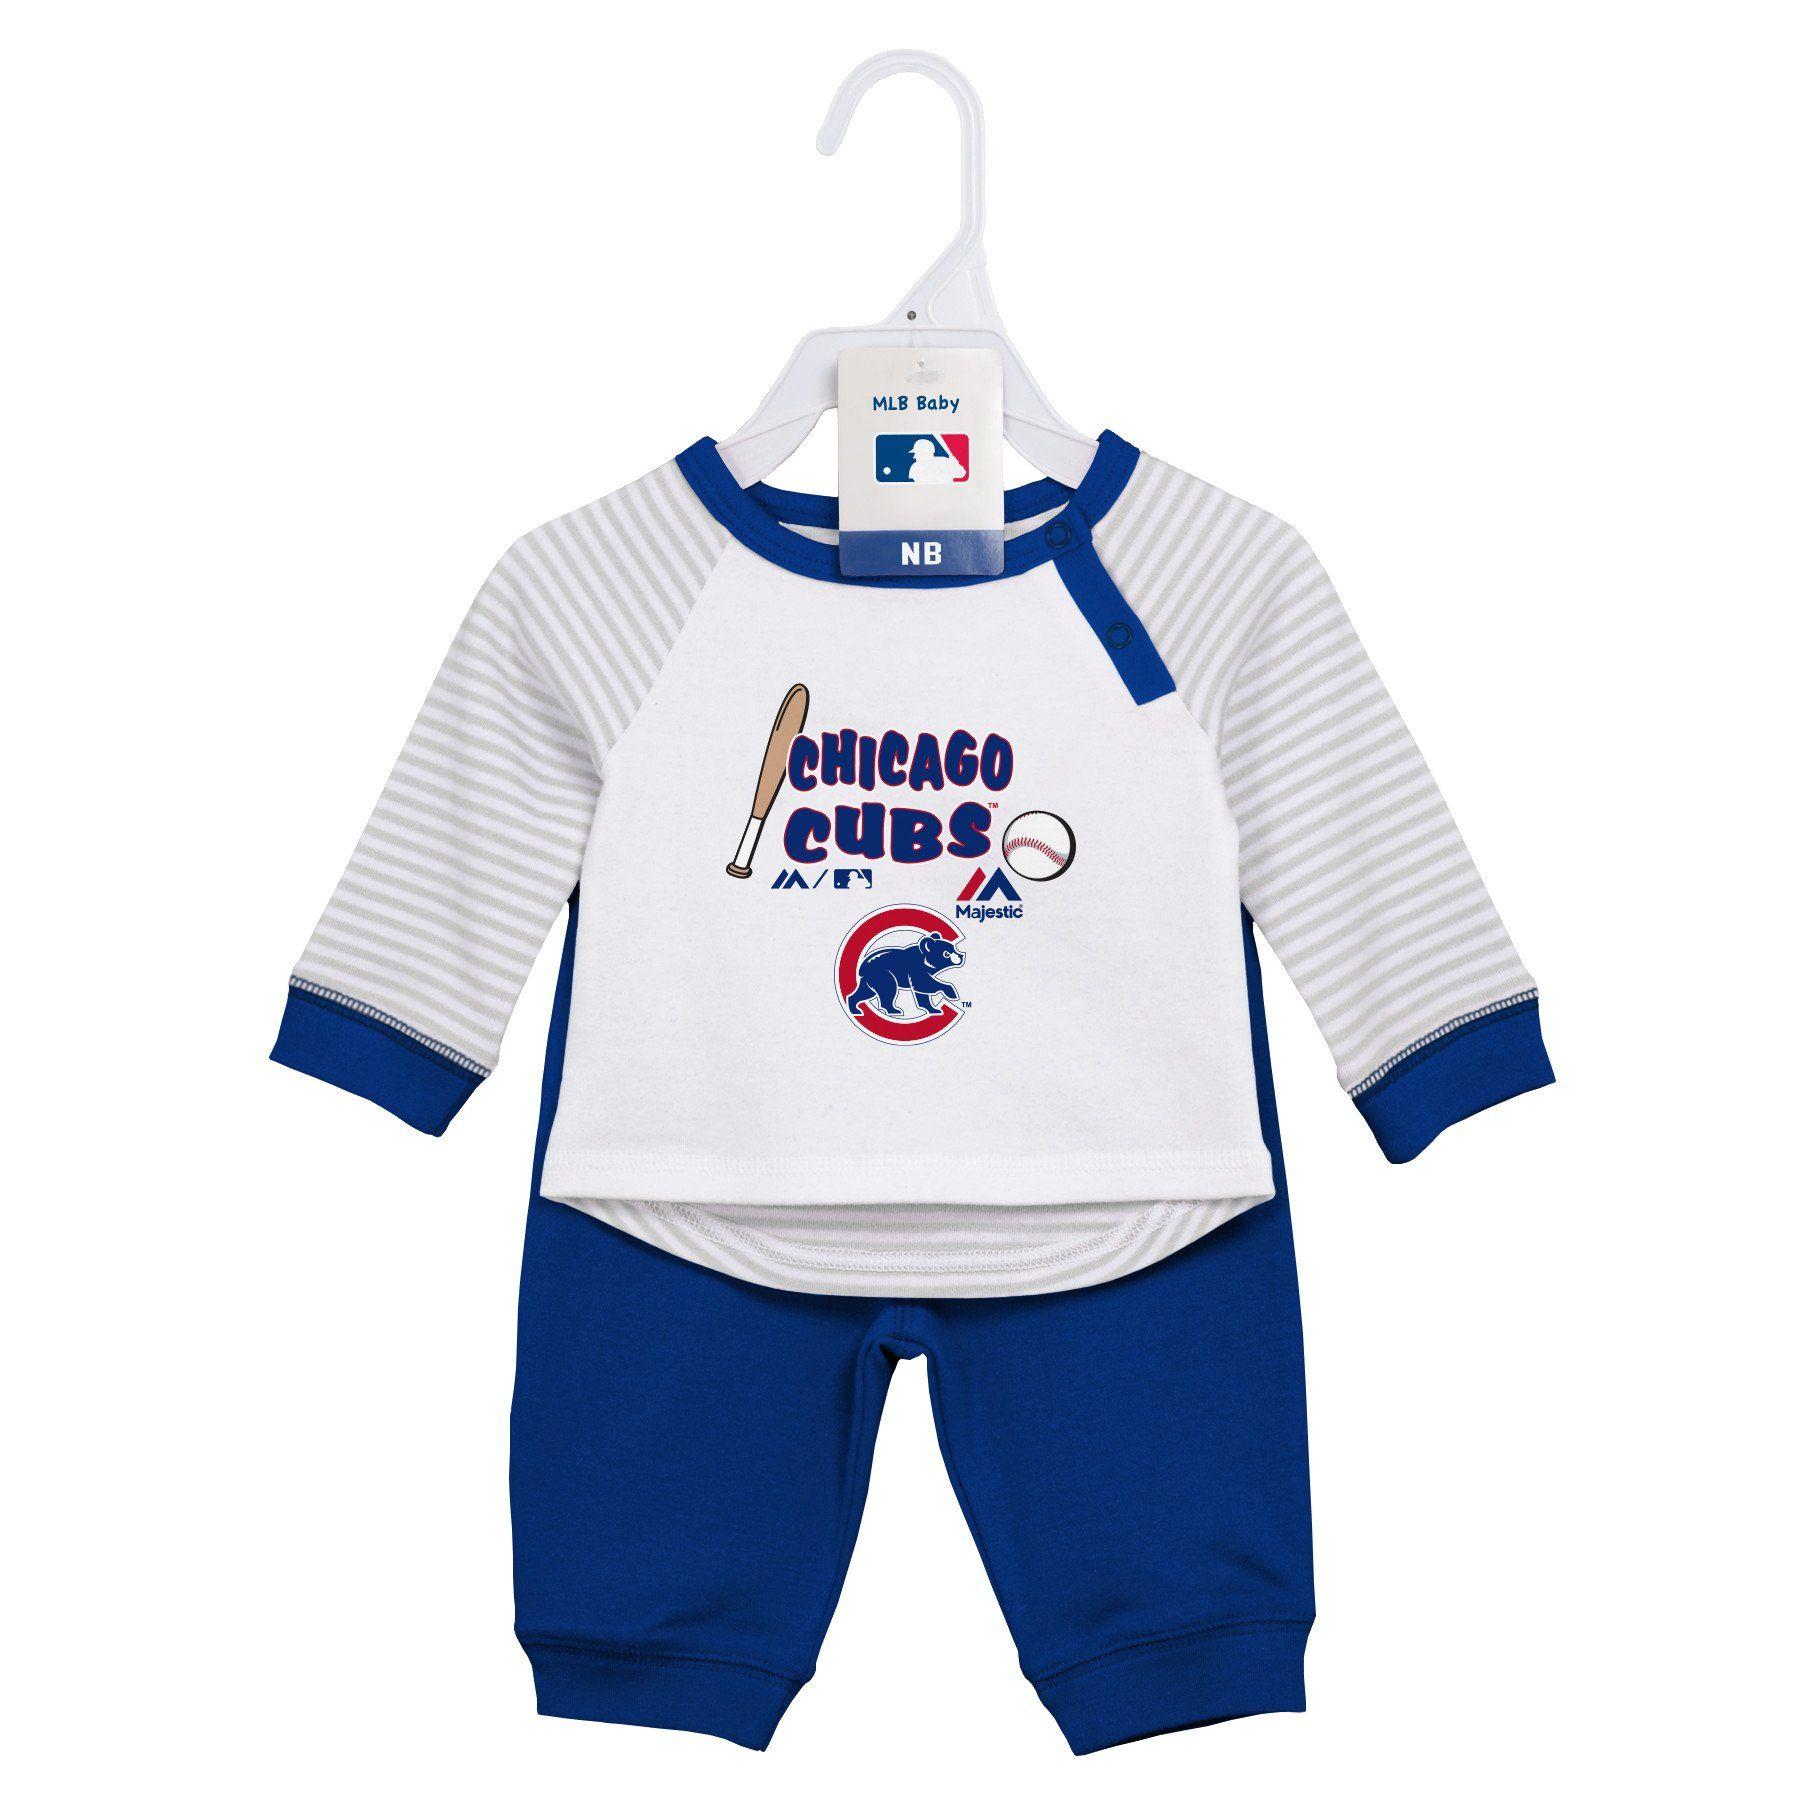 Chicago Cubs Scrimmage 2 Piece Set